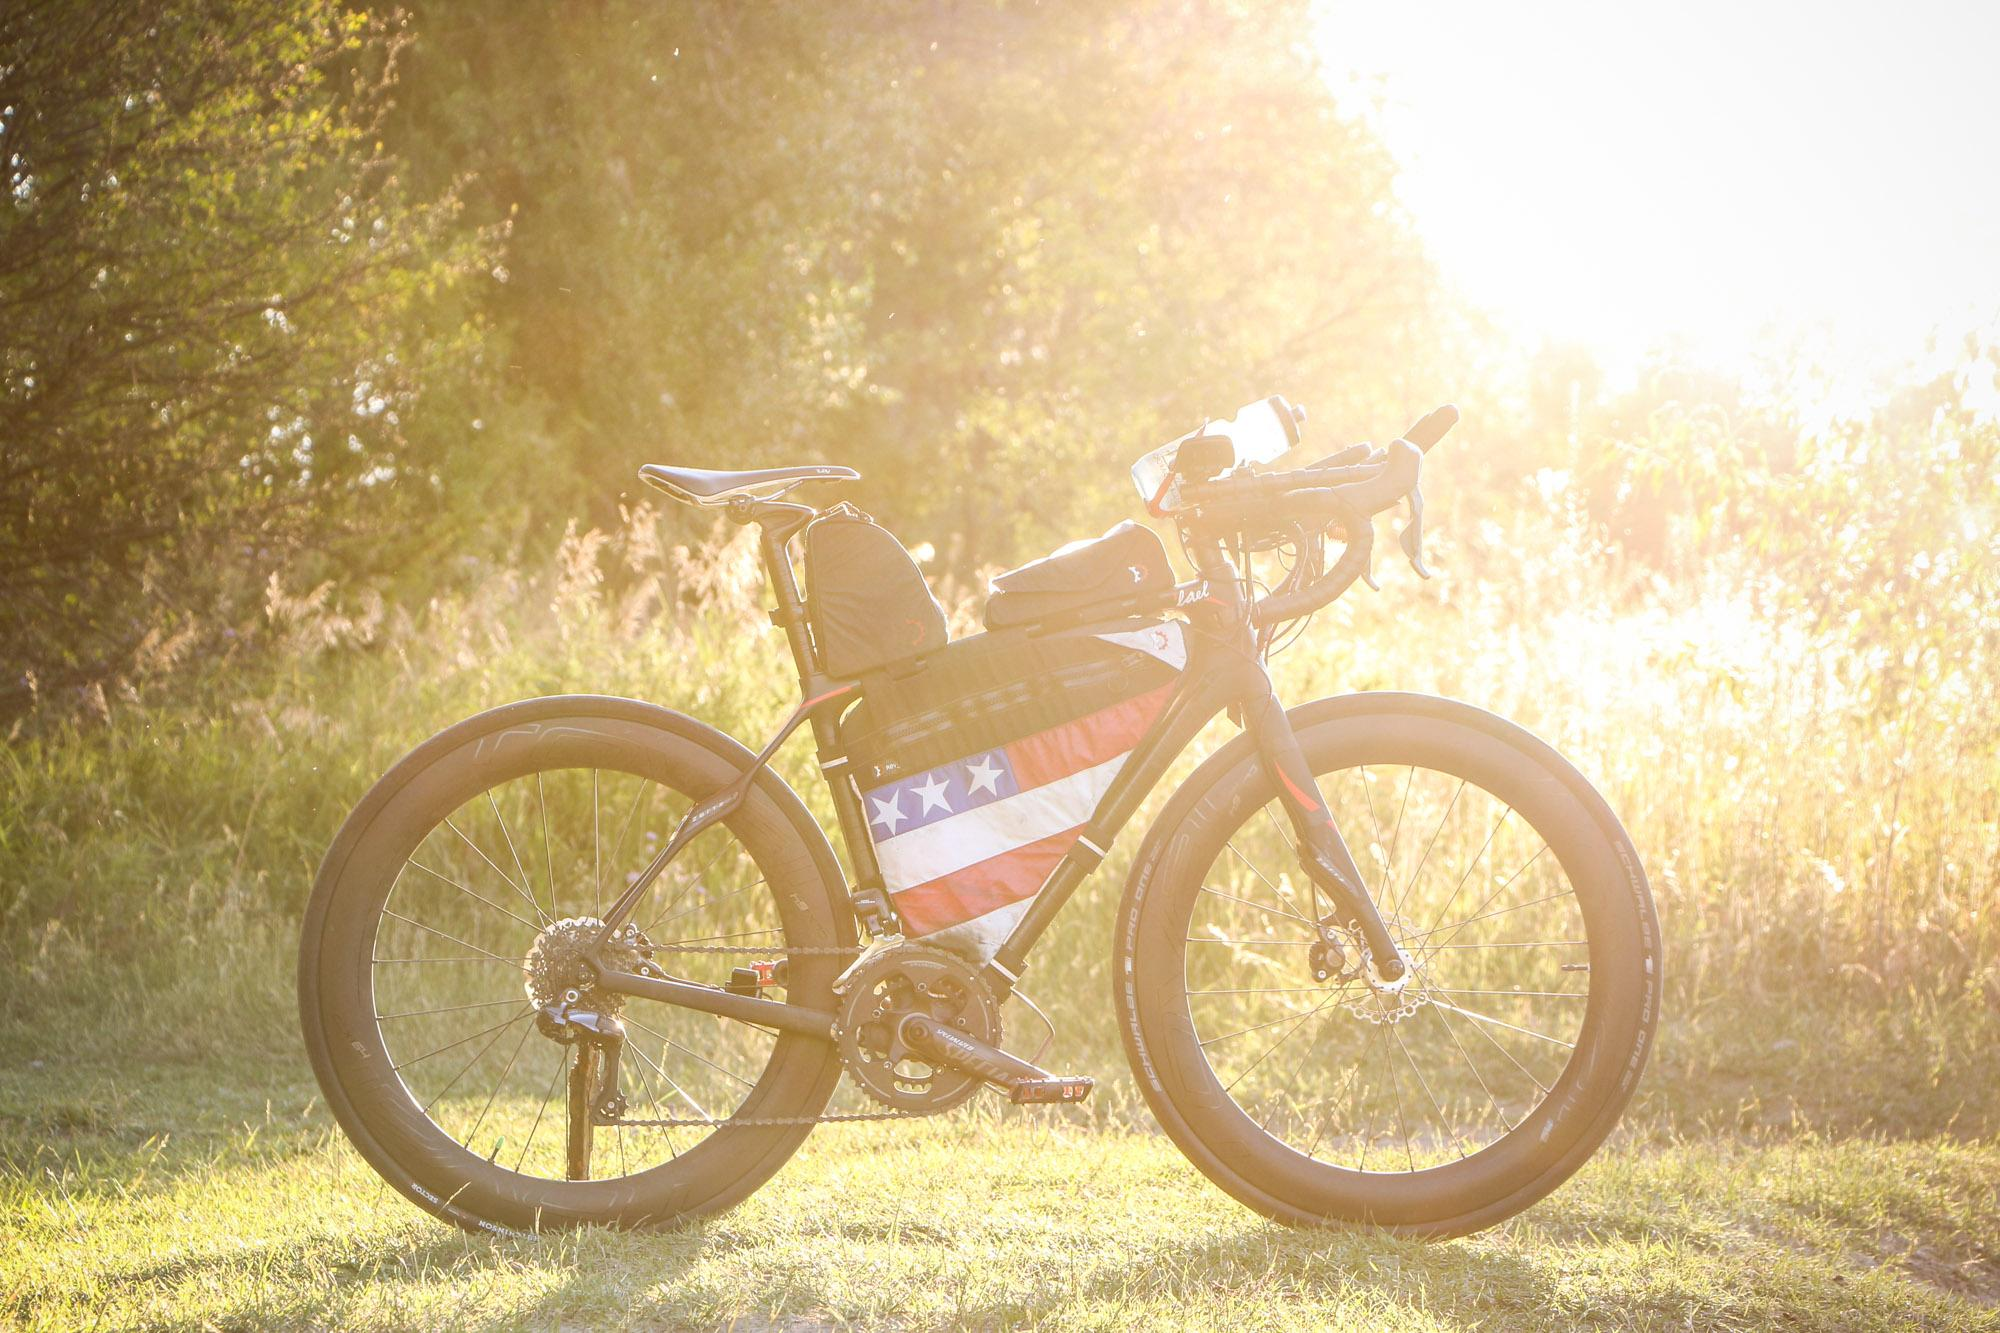 Lael Wilcox's TransAm winning bike.